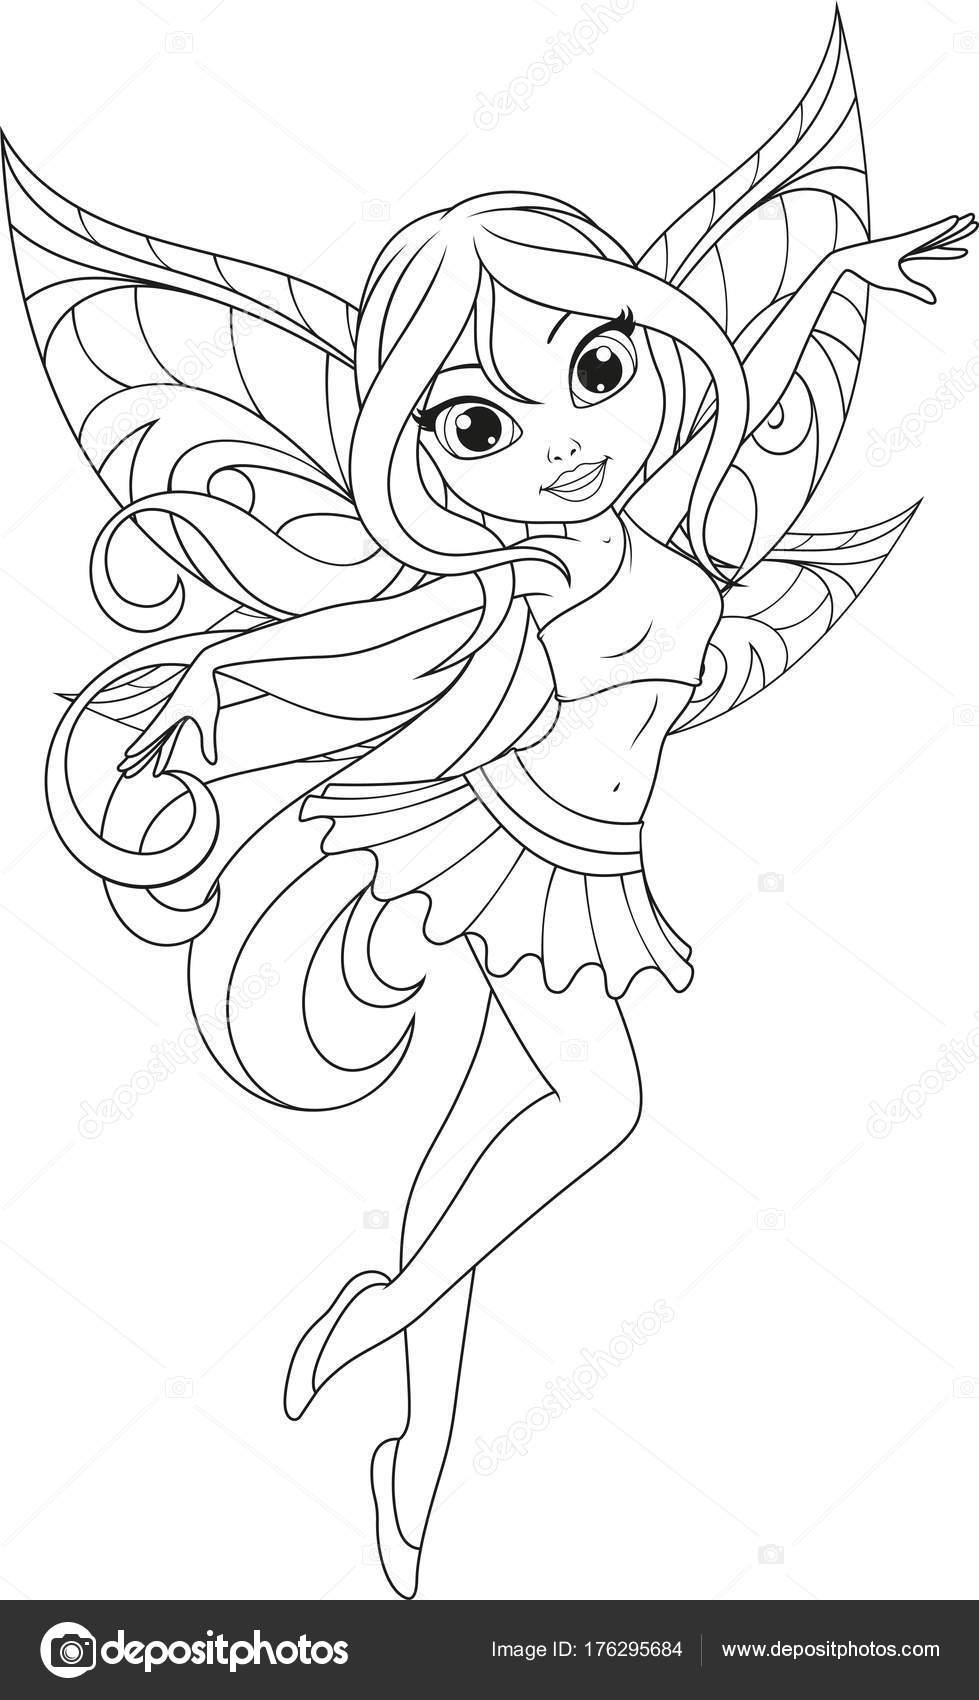 Alas de hadas para dibujar | Linda hada con alas — Vector de stock ...